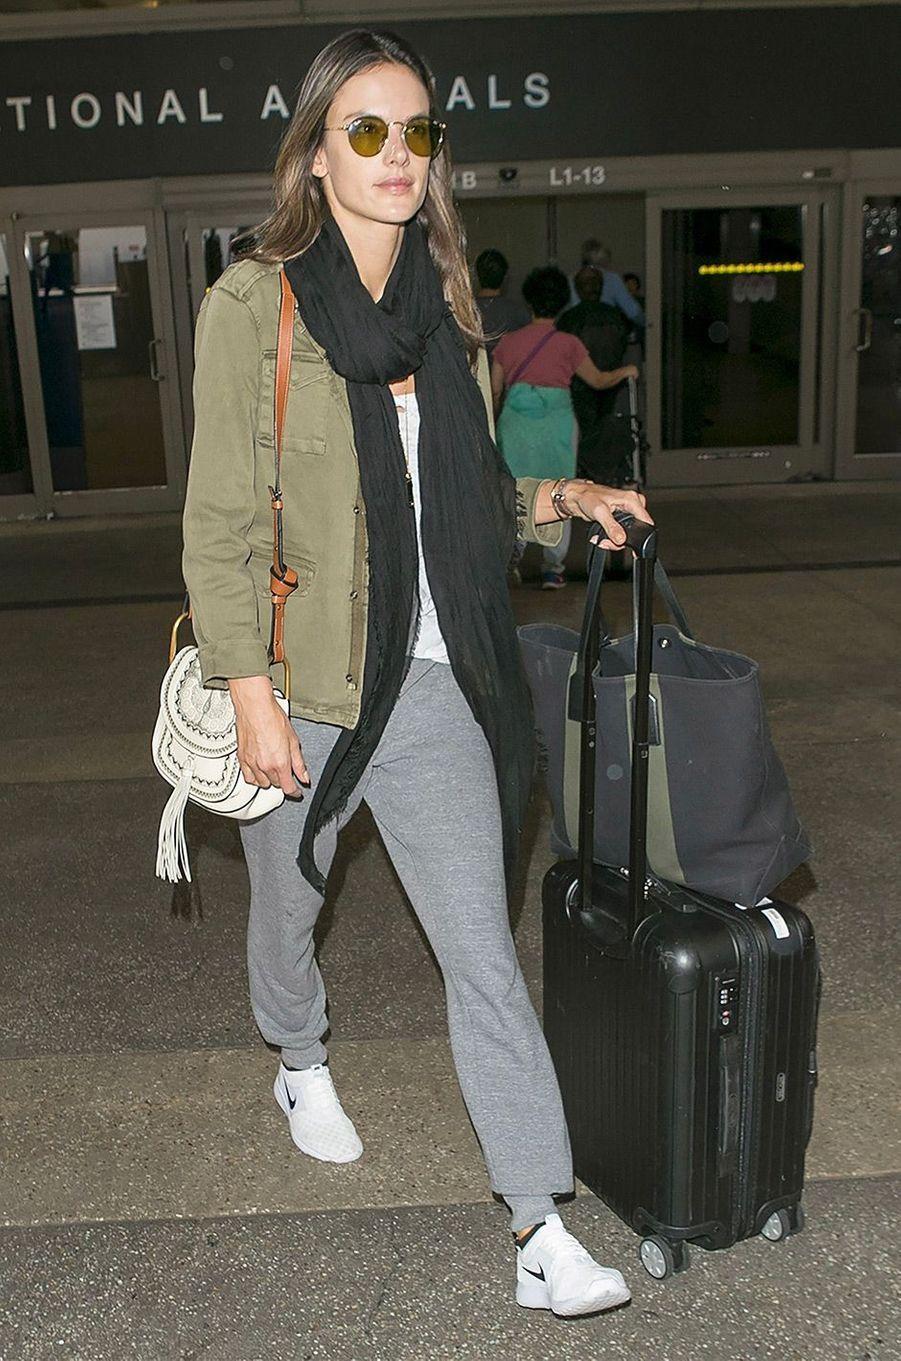 Alessandra Ambrosio à l'aéroport de Los Angeles, le 28 mars 2018